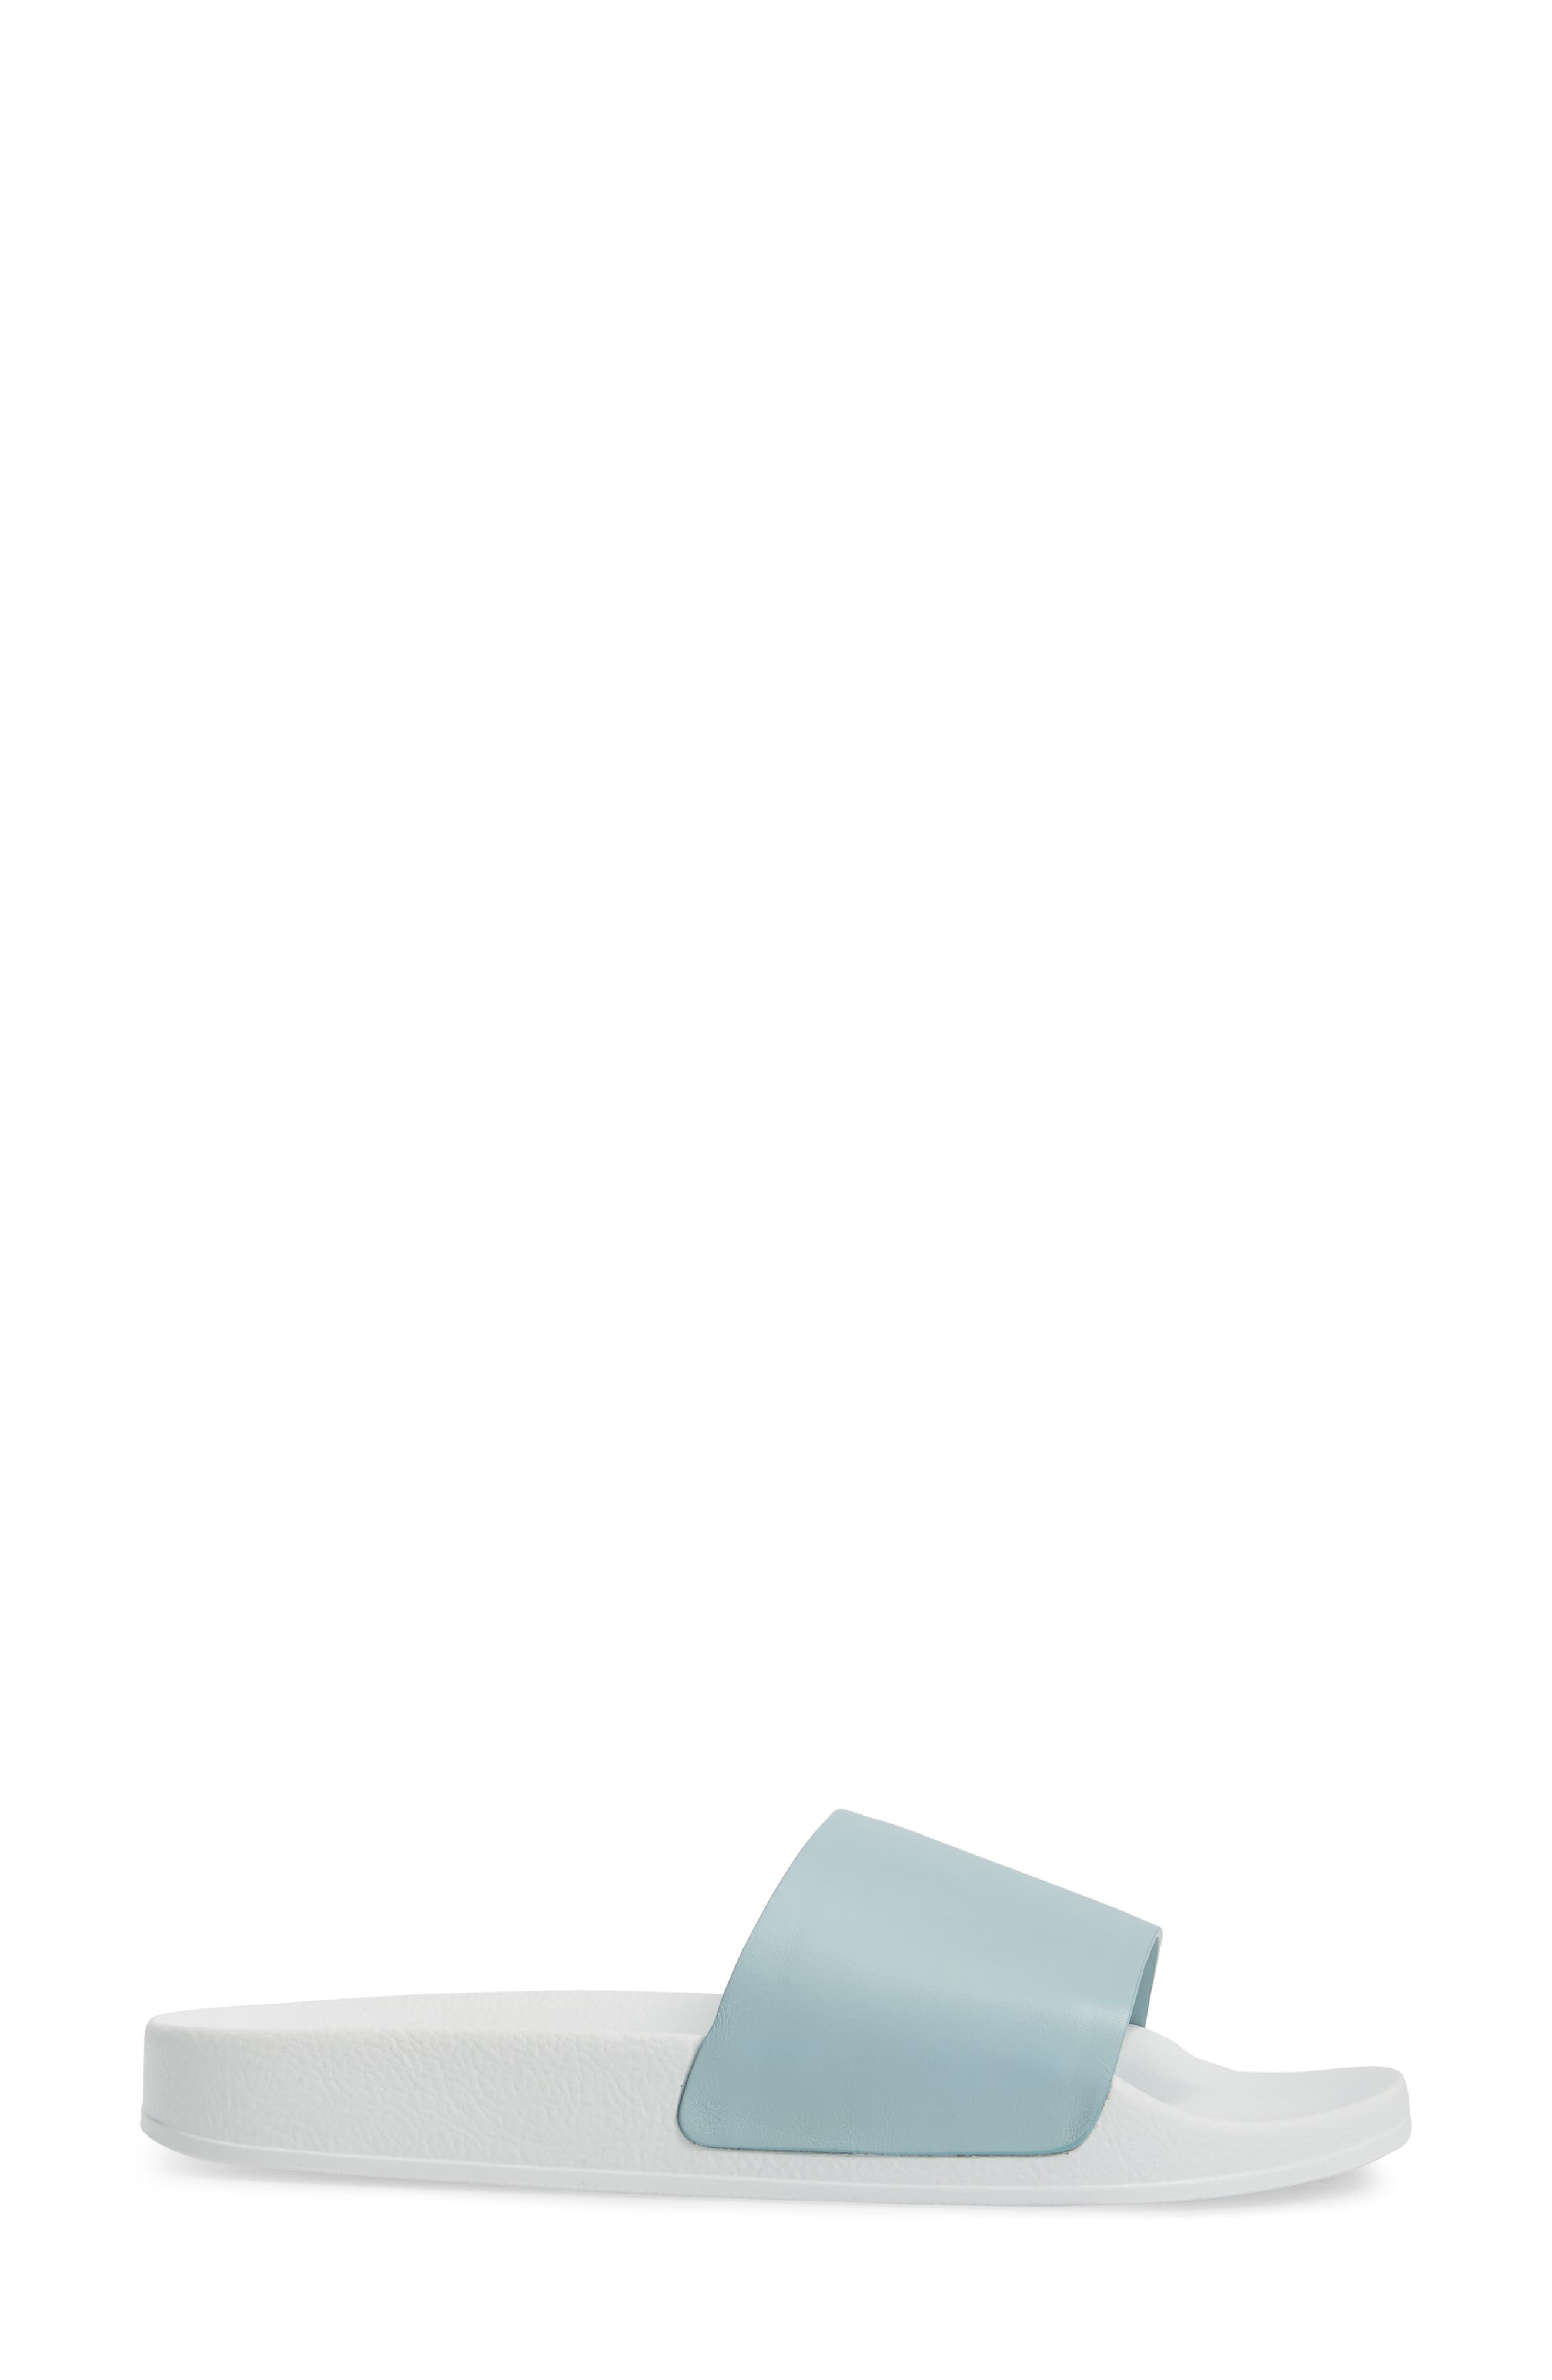 Alternate Image 3  - Greats Amalfi Slide Sandal (Women)